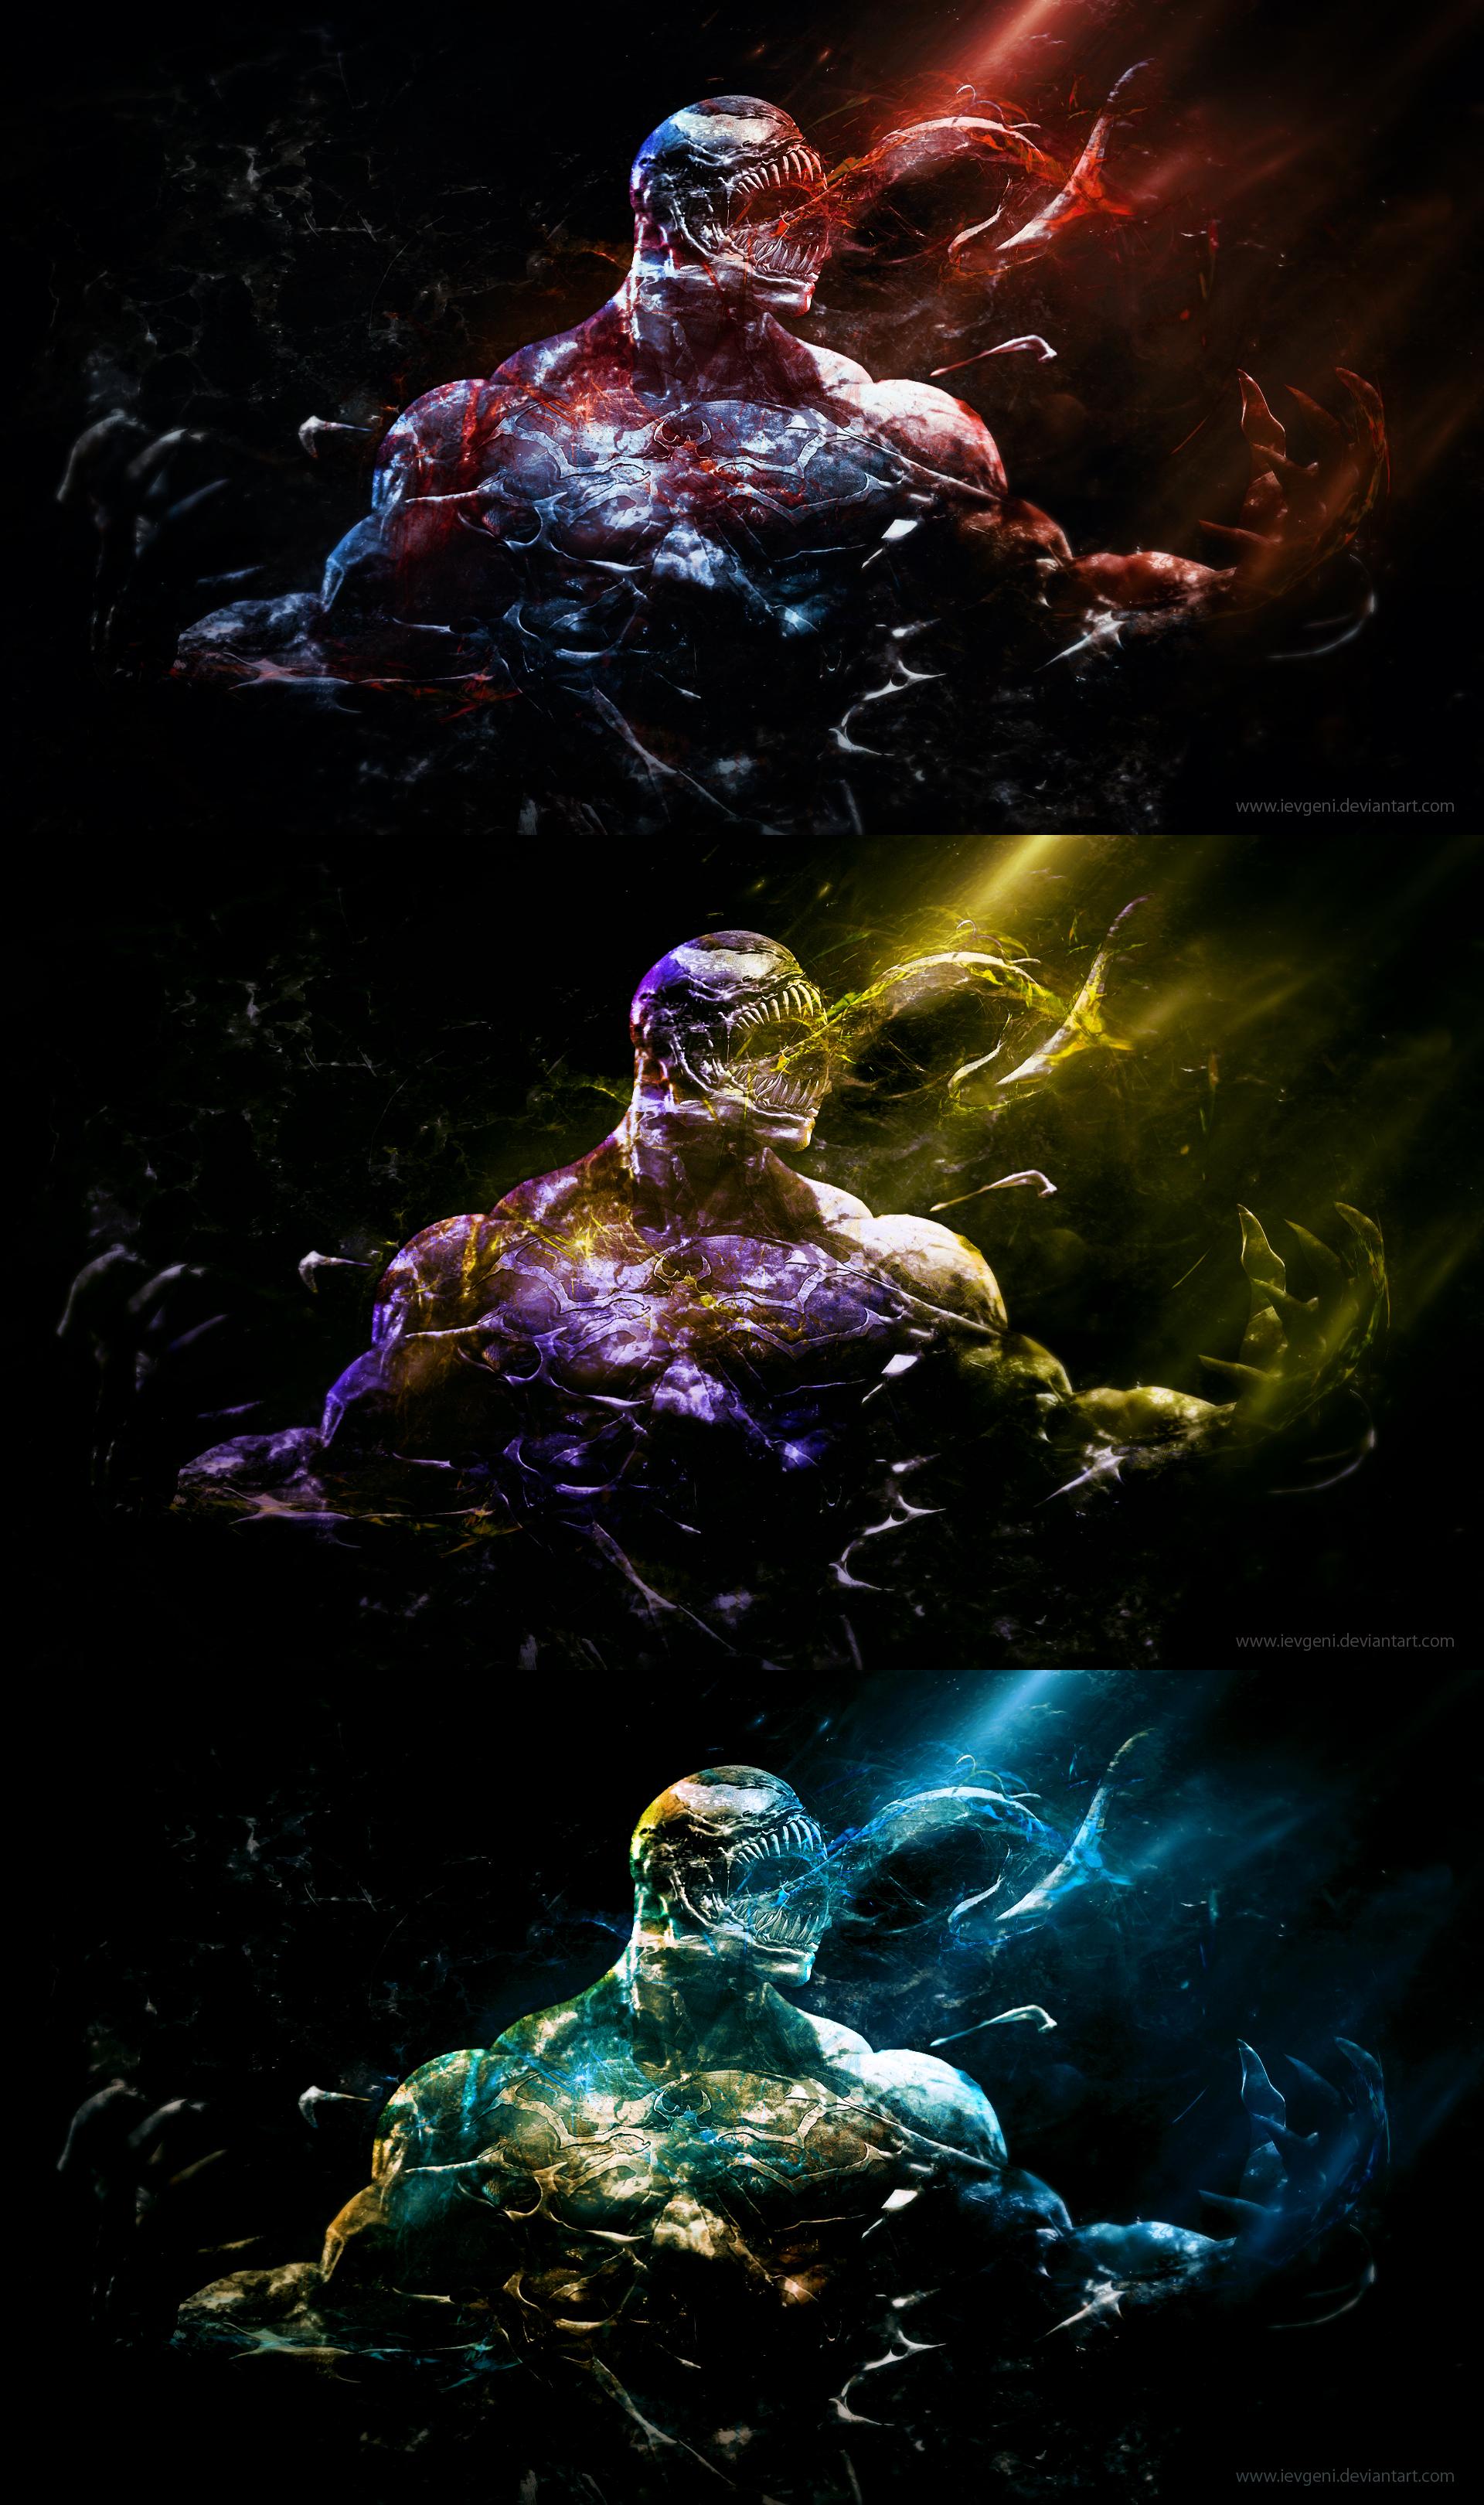 Venom wallpapers by iEvgeni 1920x3240